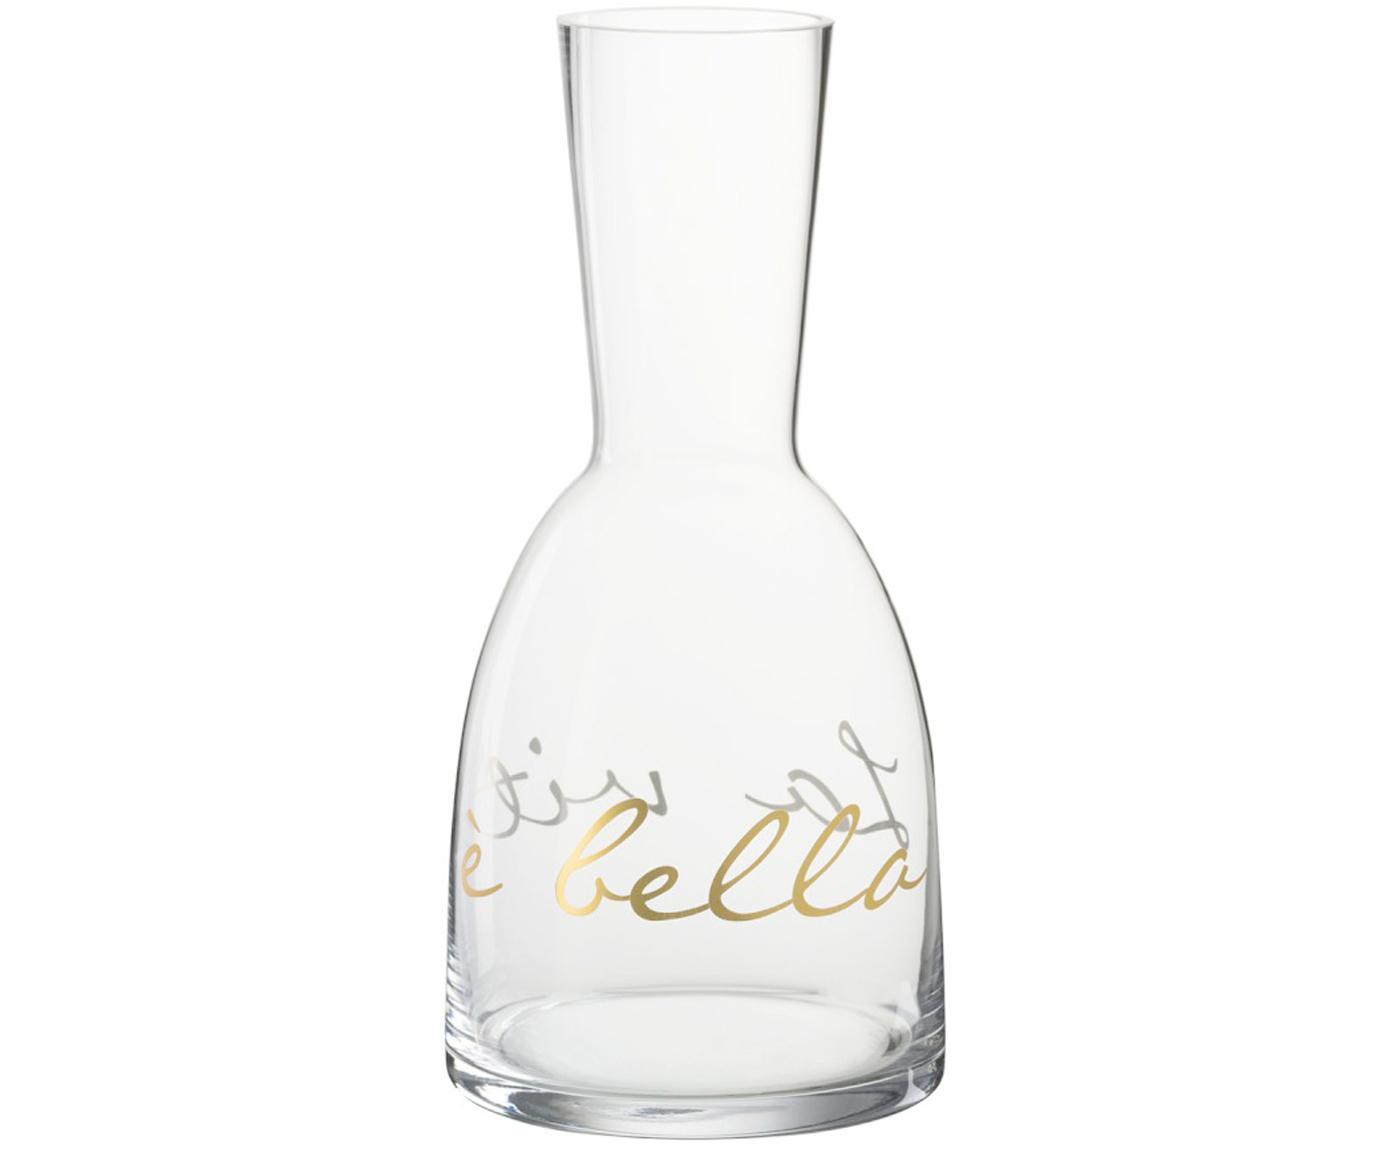 Karaf La Vita, Glas, Transparant, goudkleurig, Ø 12 x H 26 cm